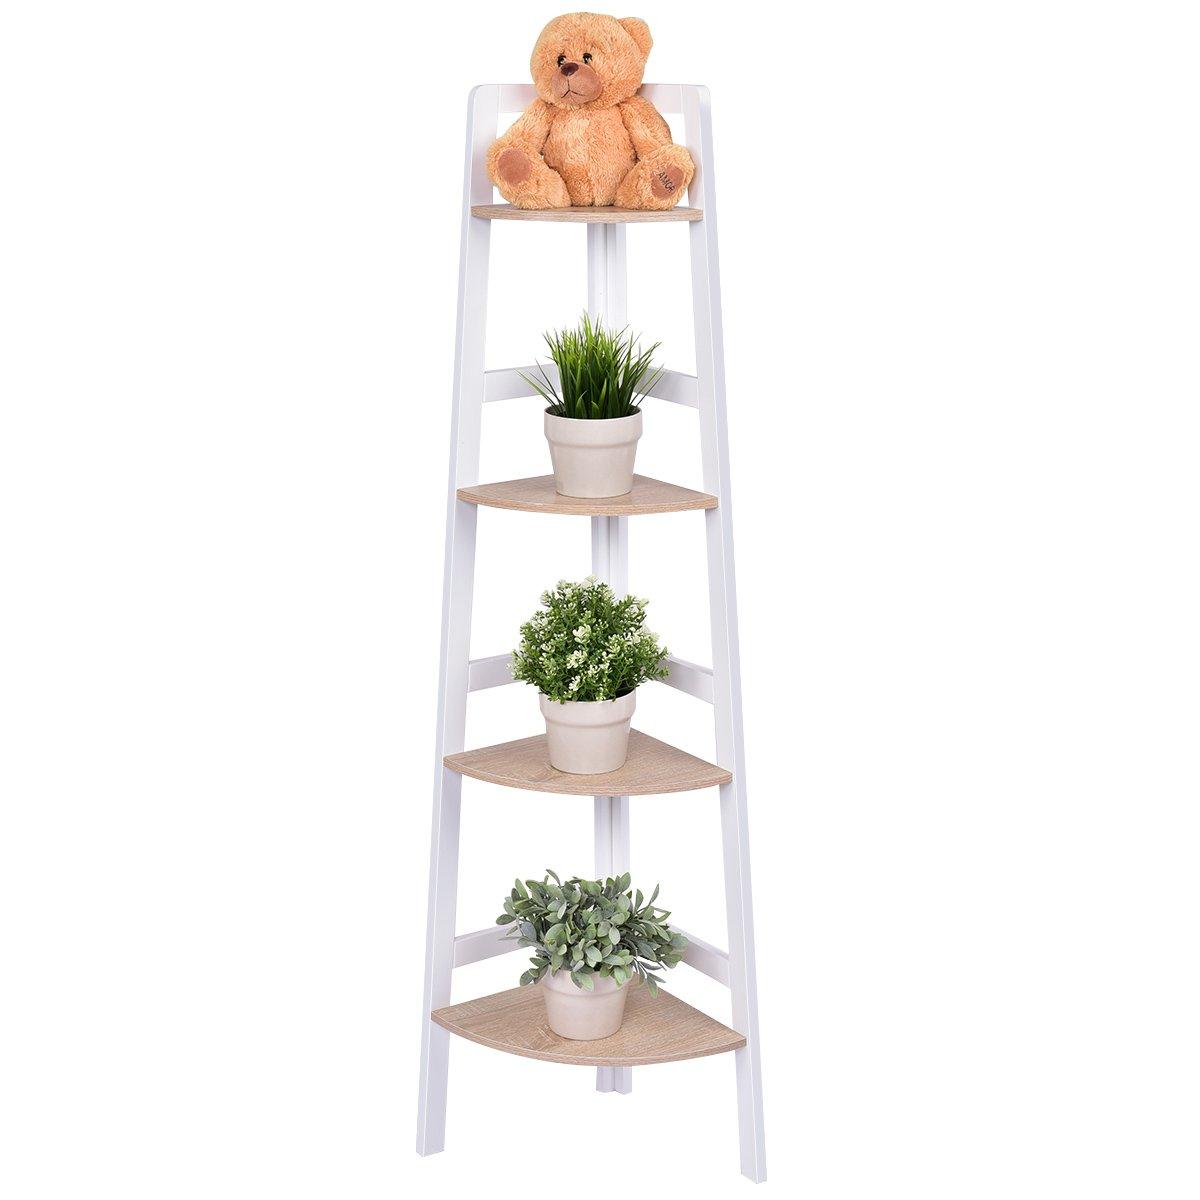 Giantex 4-Tier Corner Shelf Wood Bookshelf Flower Plant Rack Ladder Bookcase Home Living Room Bedroom Bathroom Kitchen Office Study Furniture Wall Corner Stand Display Shelf Open Fan-Shaped Shelf